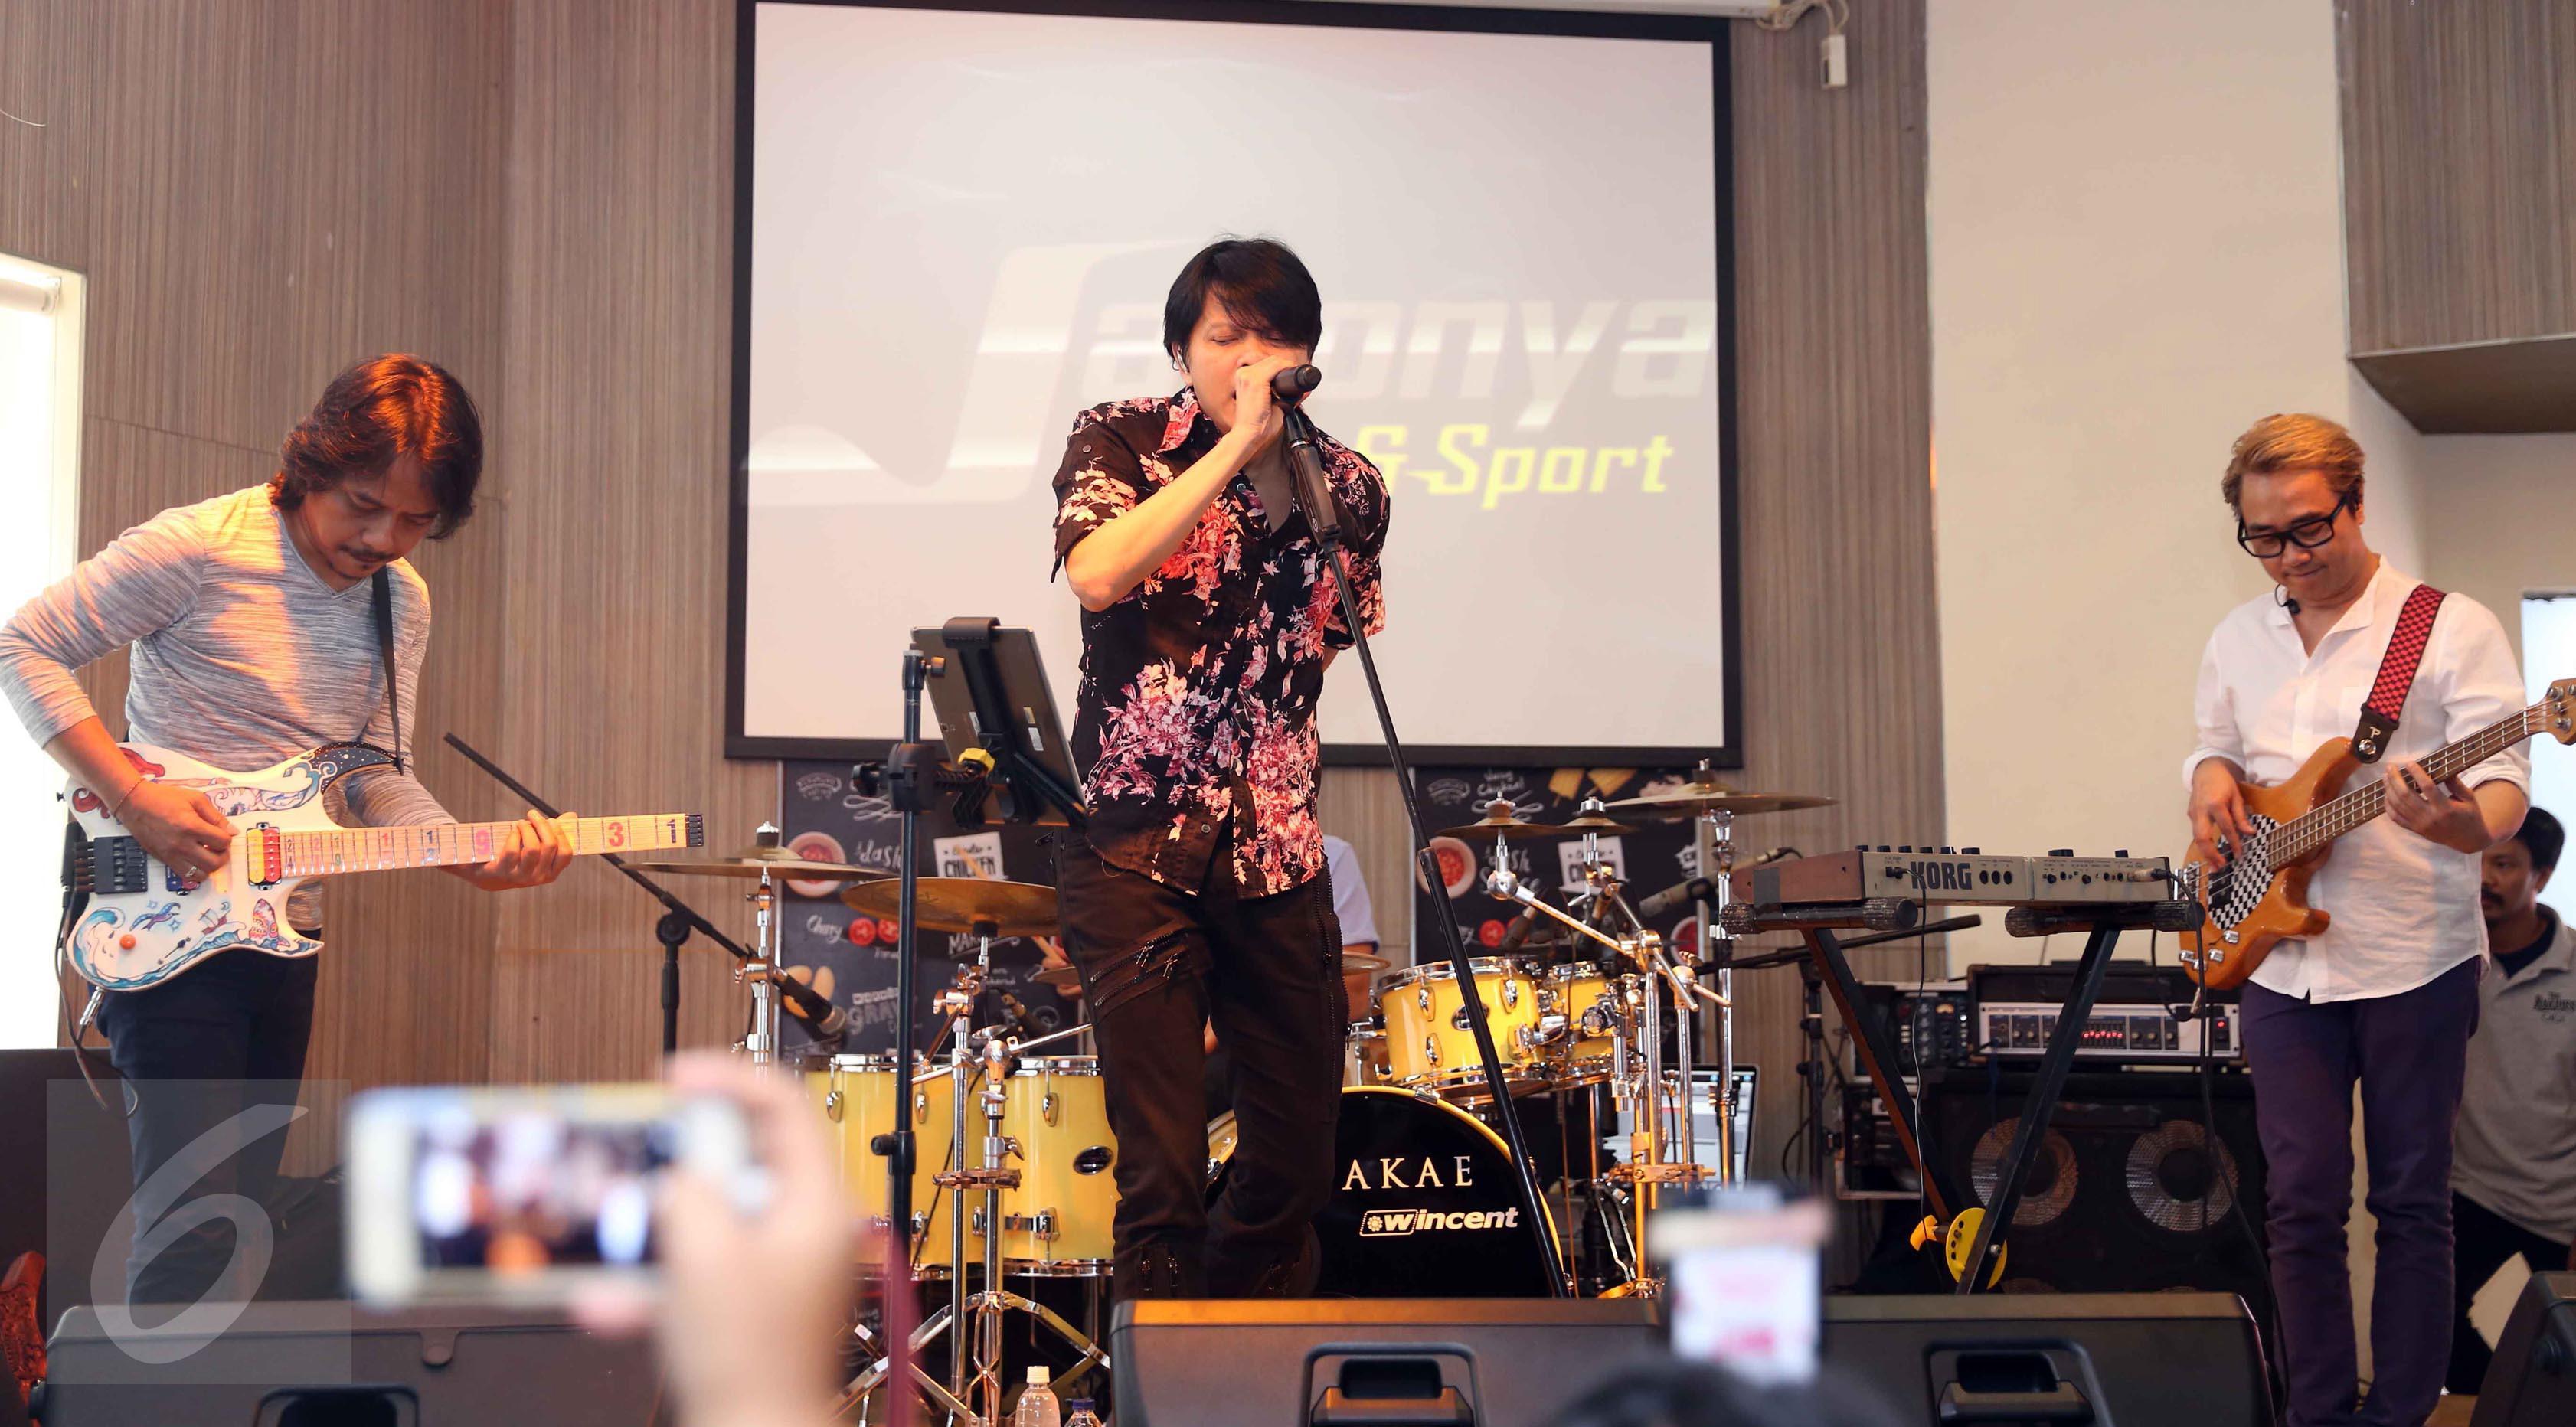 Penampilan band GIGI seusai peluncuran album religi ke-9 di kawasan Kemang, Jakarta, Senin (15/5). Band GIGI launching album religi ke - 9 bertajuk